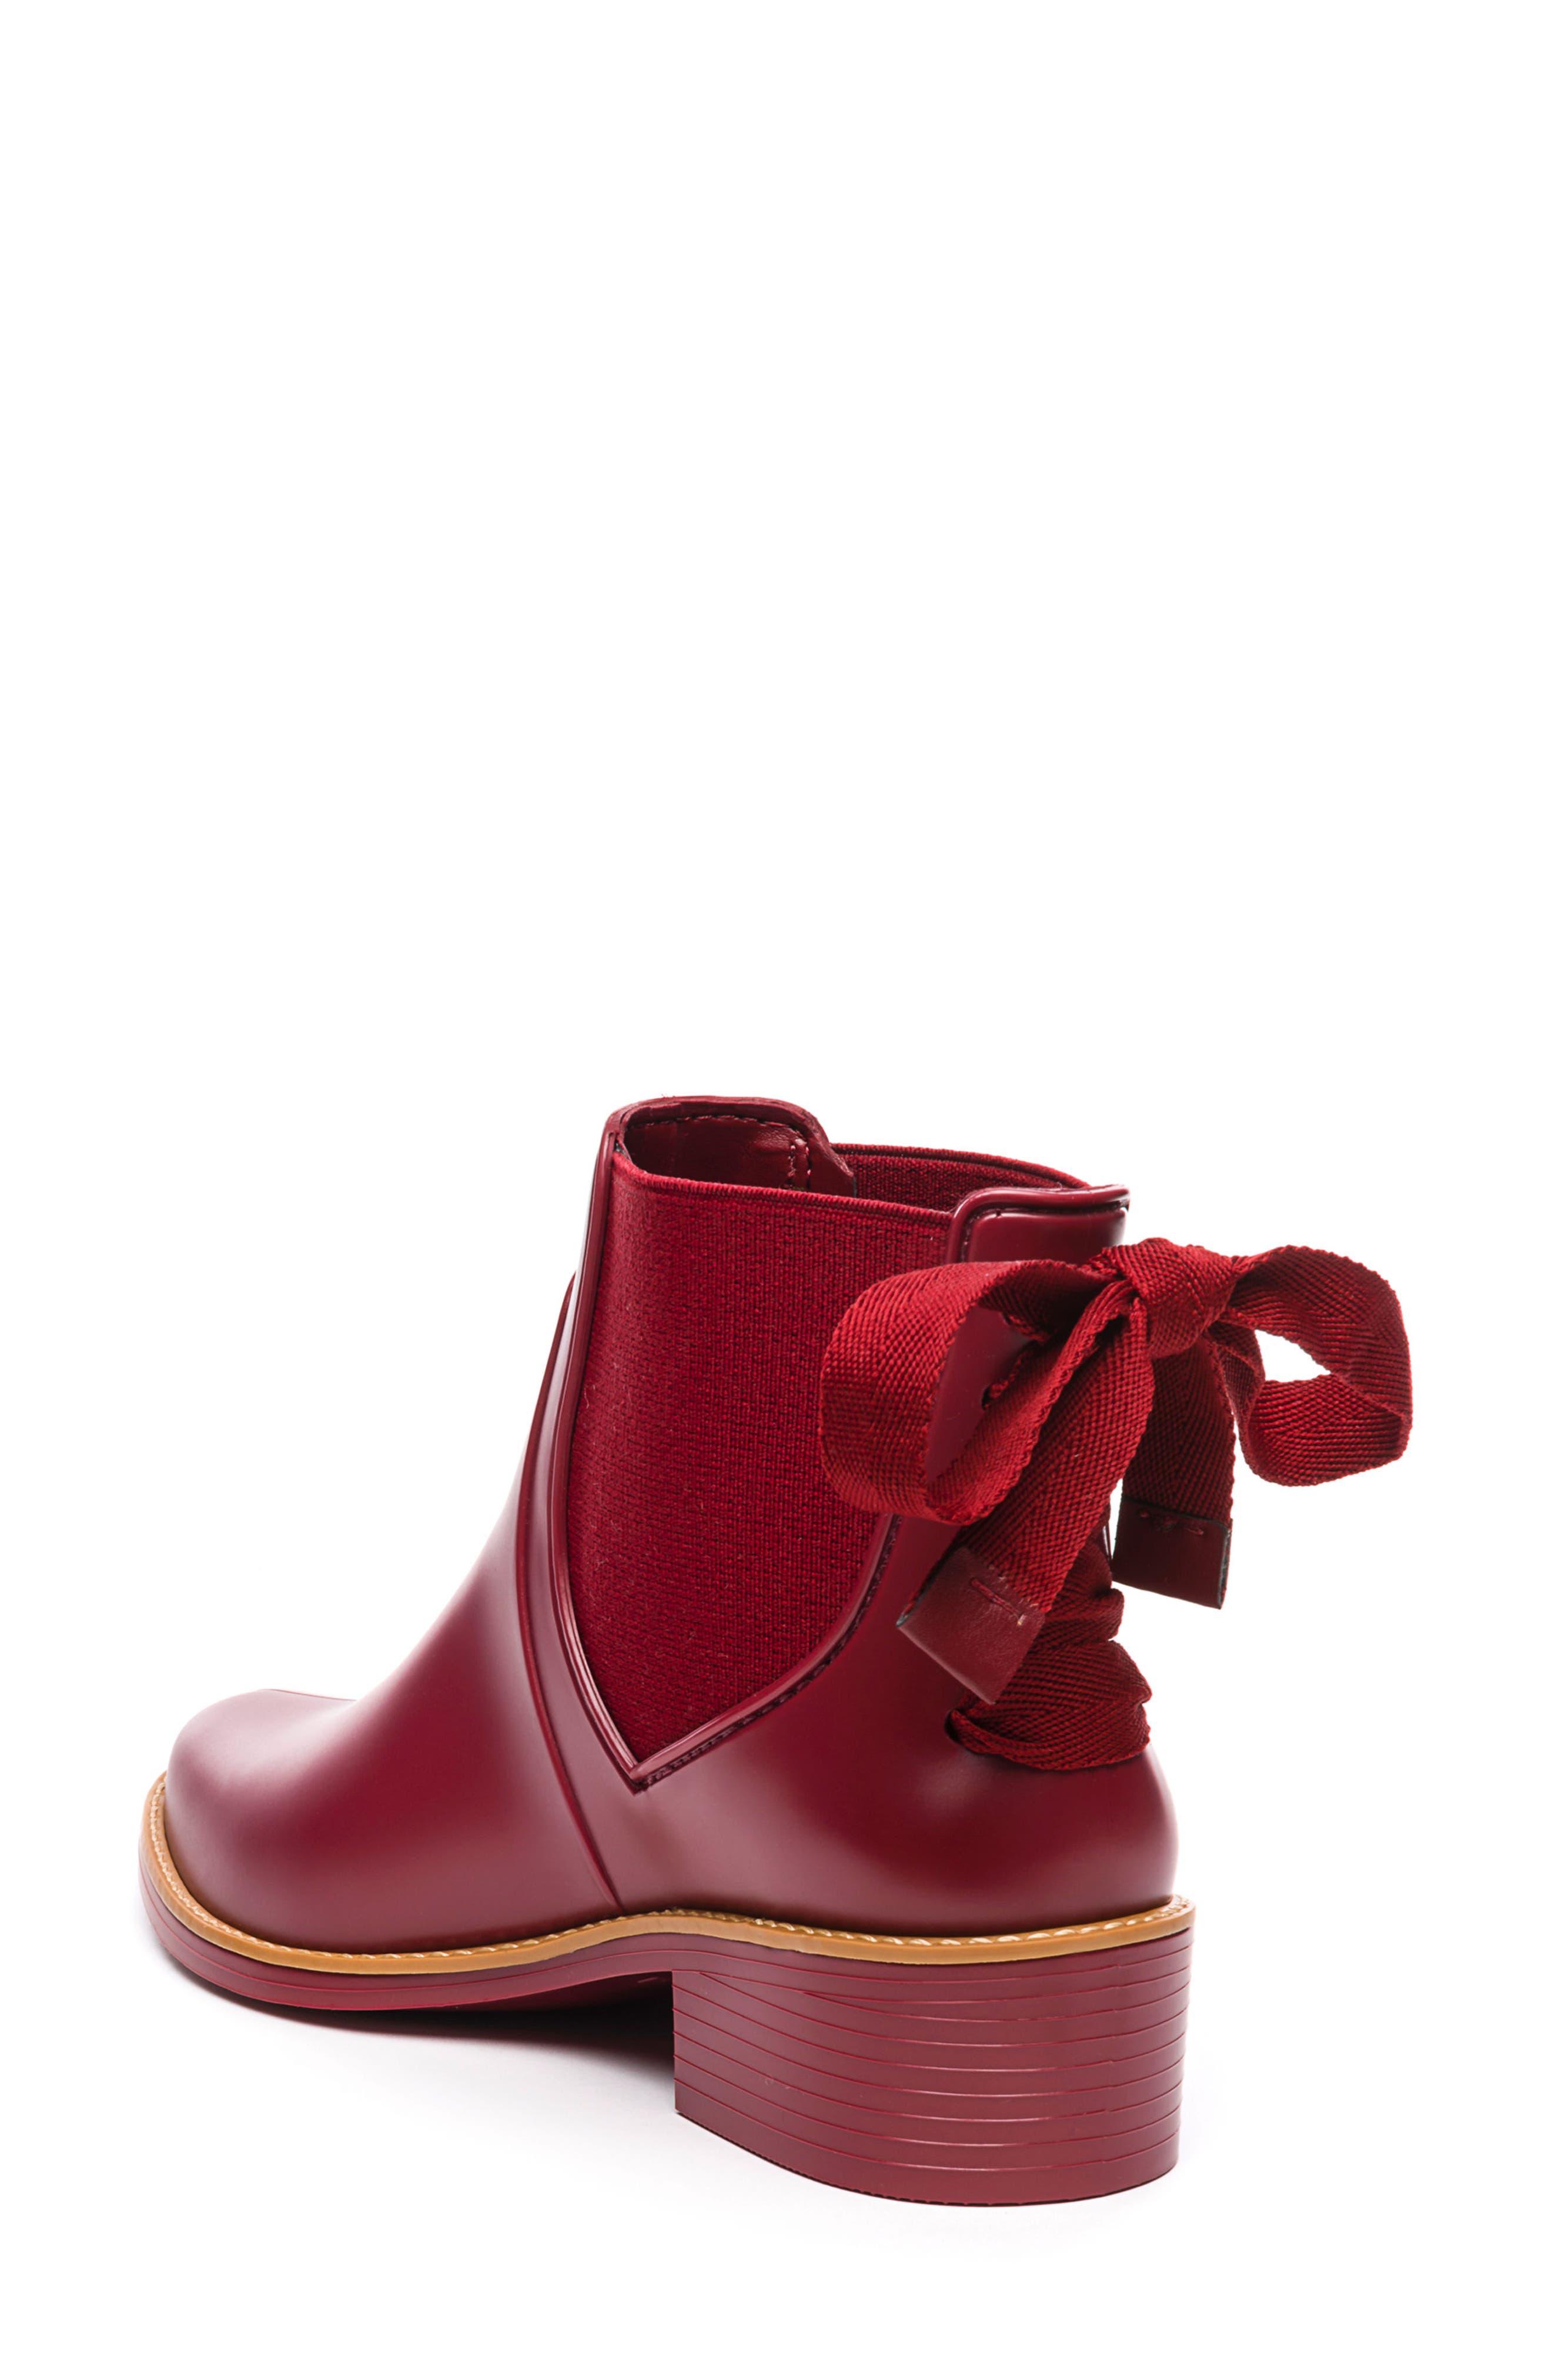 Paxton Rain Boot,                             Alternate thumbnail 2, color,                             930